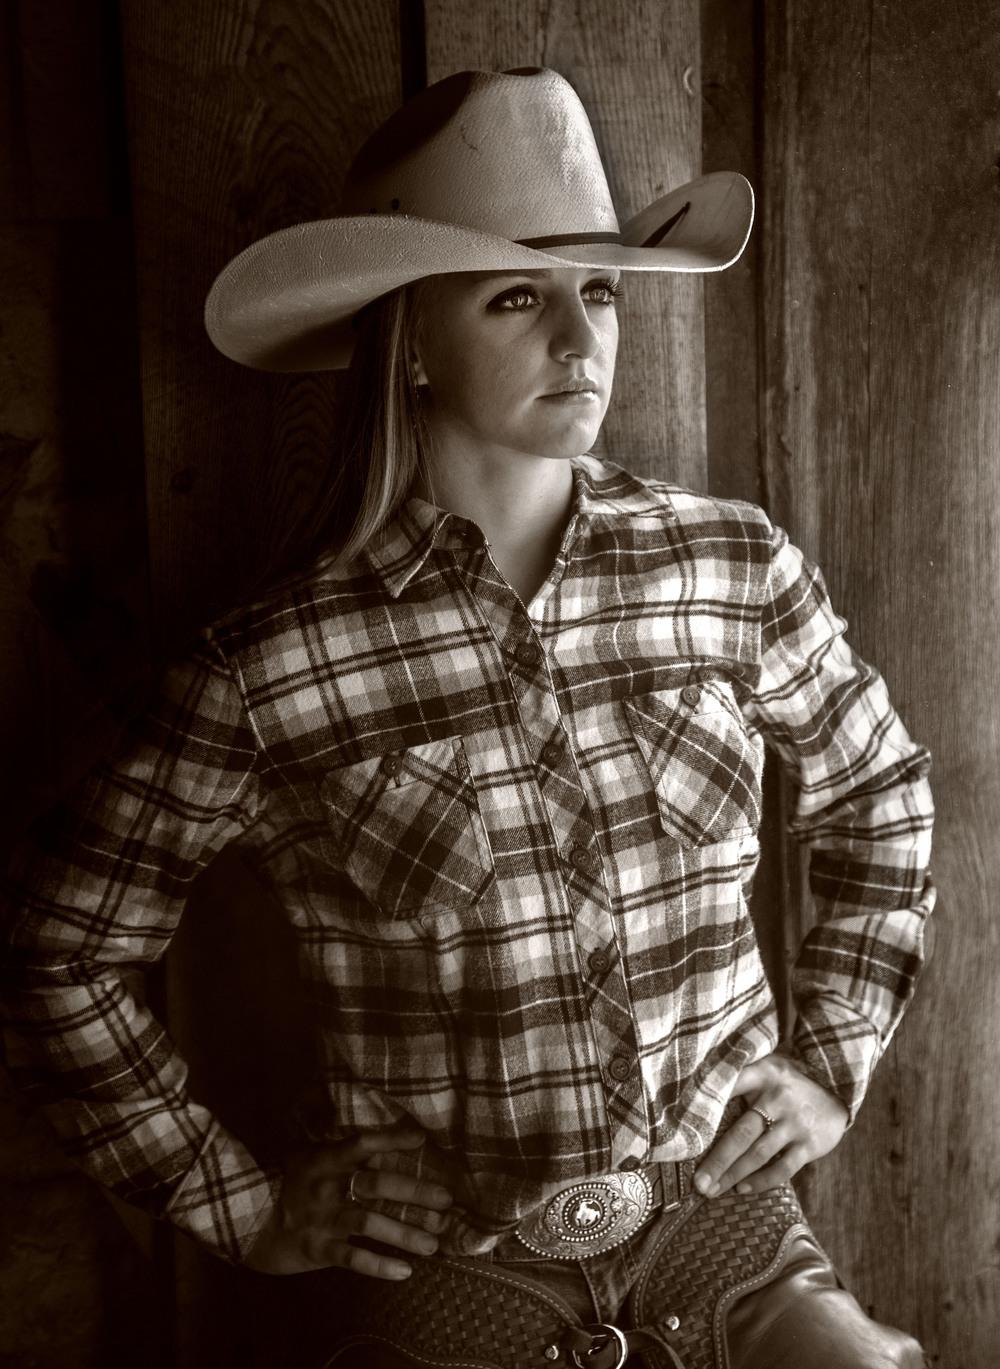 Cowgirl 1.jpg